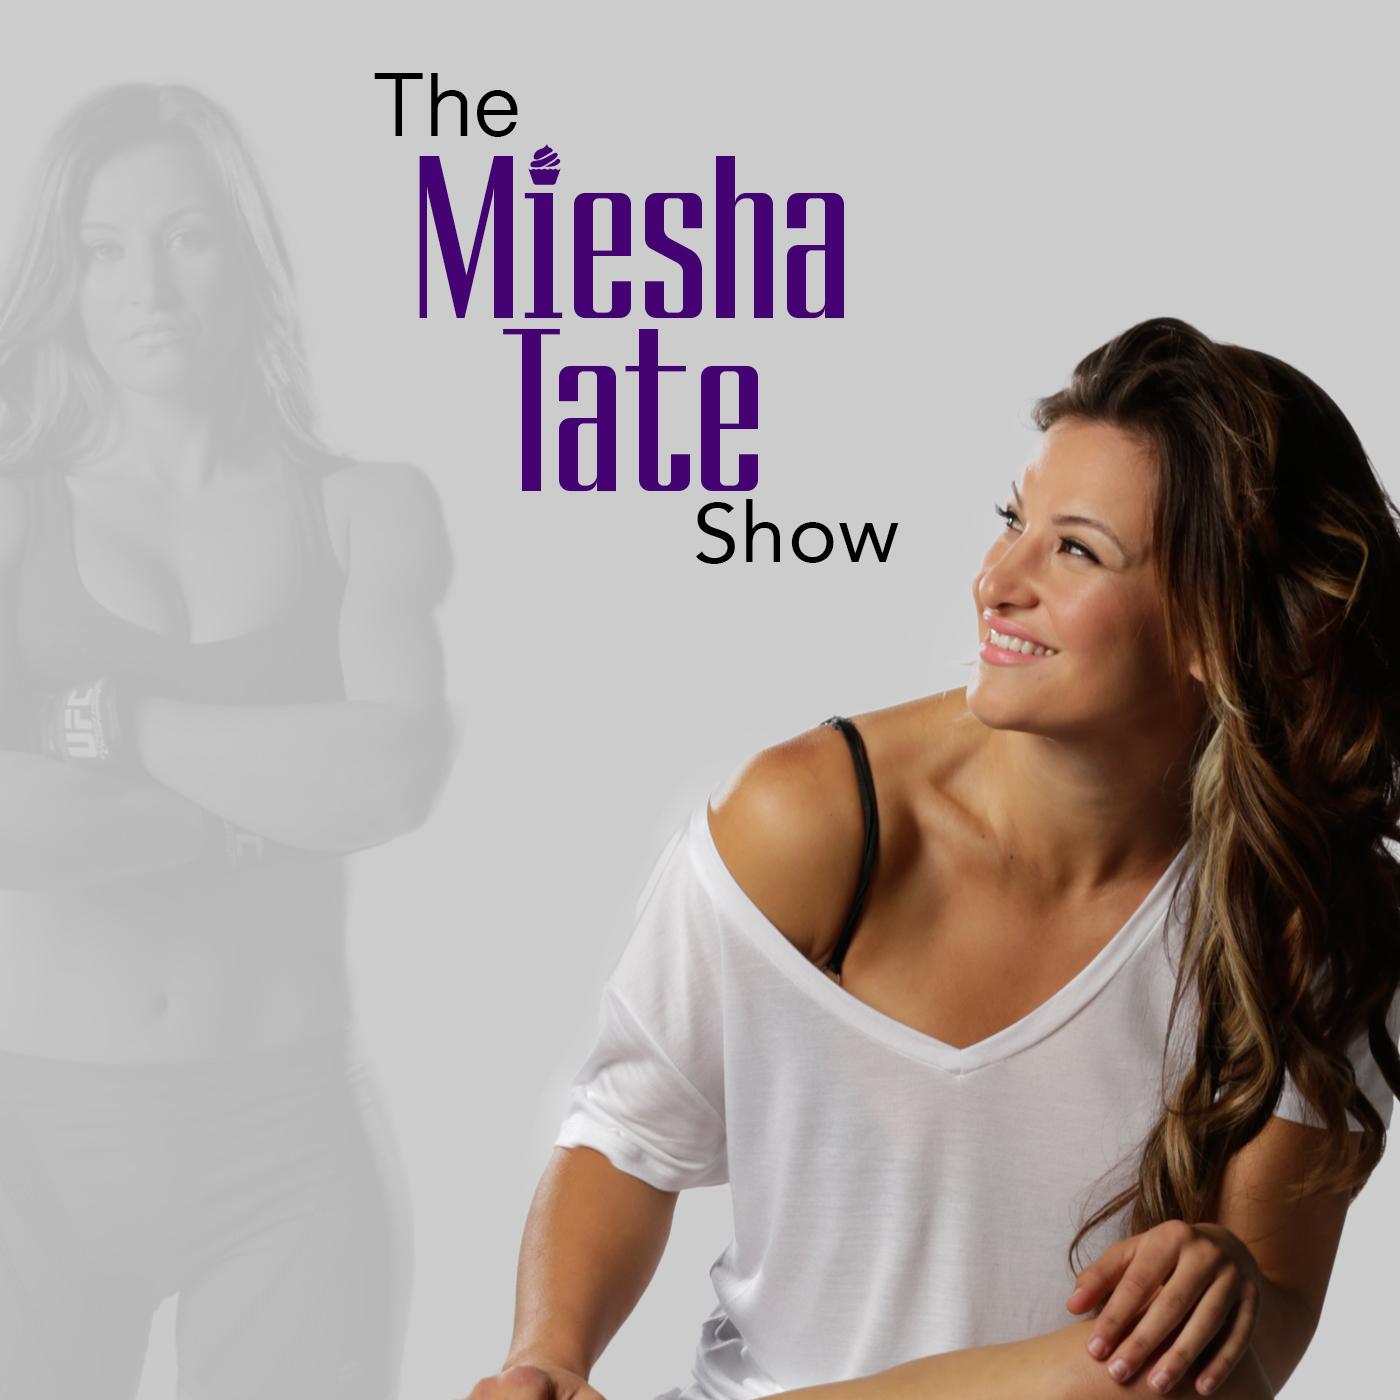 Miesha tate clipart image freeuse stock The Miesha Tate Show on Apple Podcasts image freeuse stock